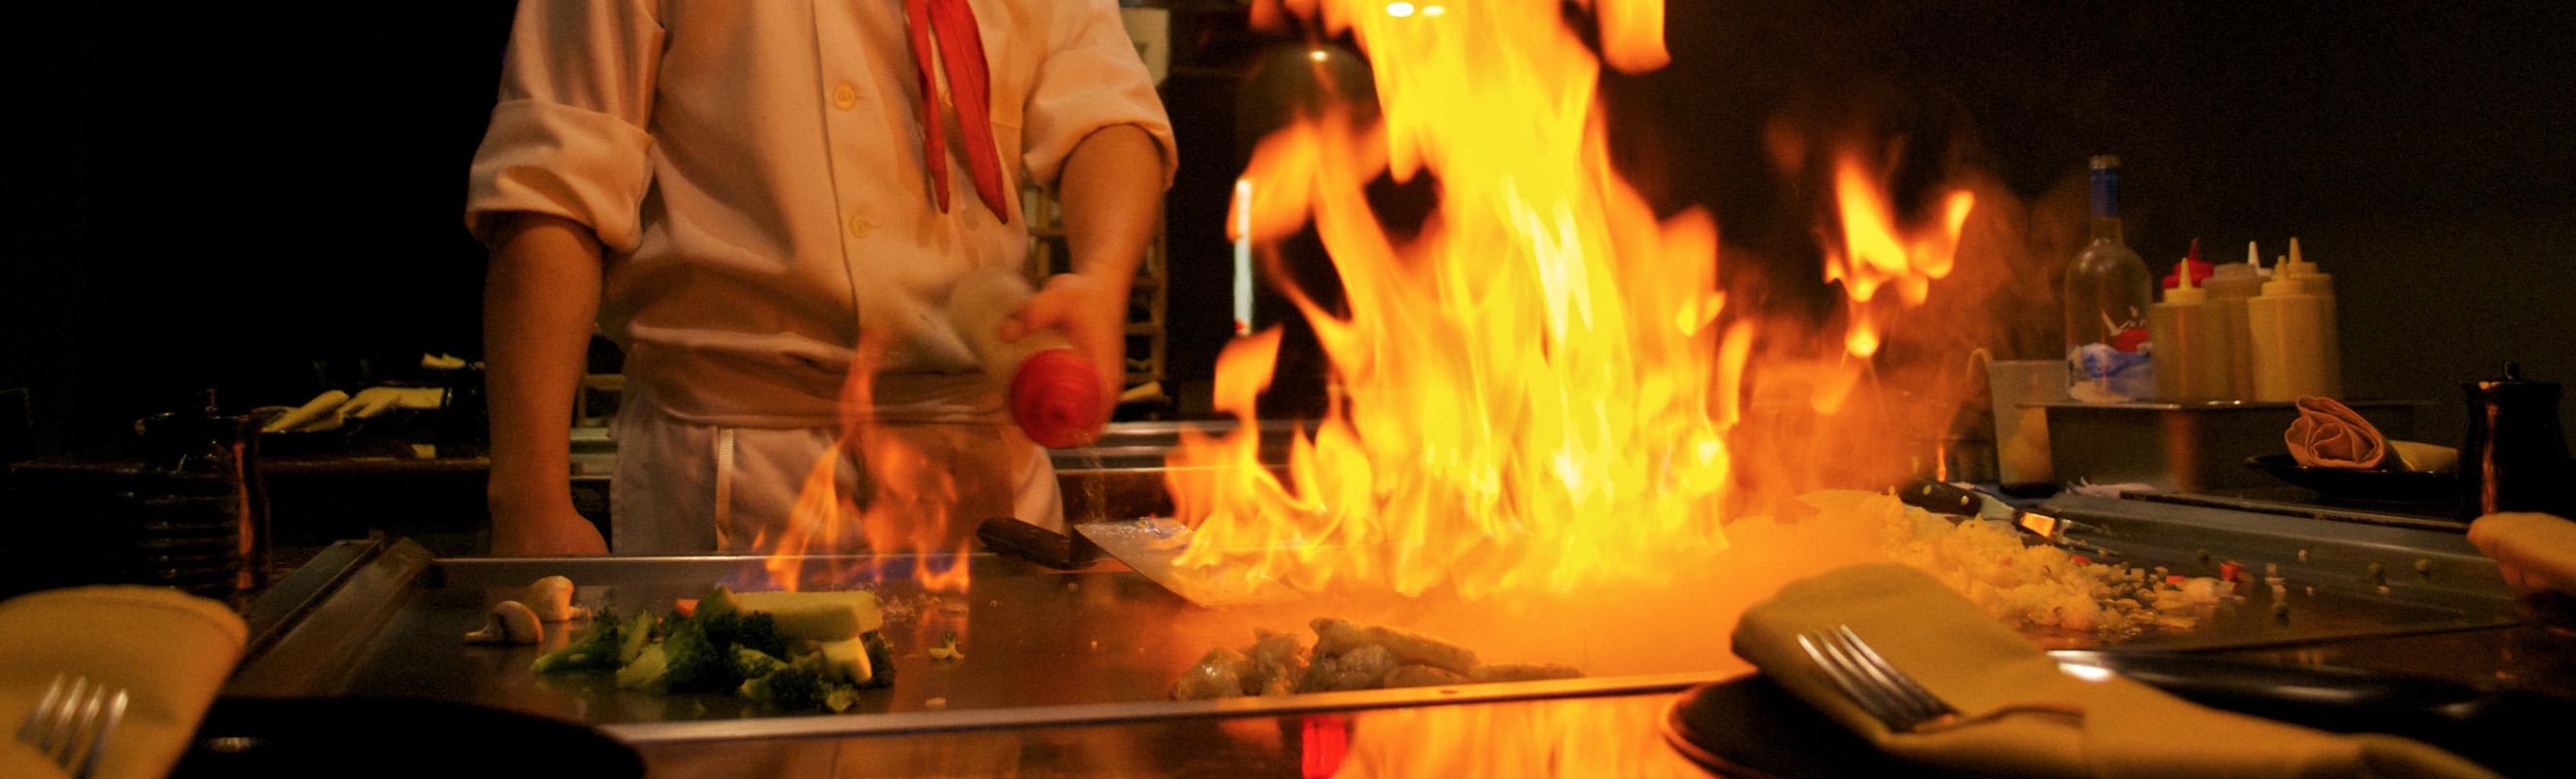 CookingFireBNR